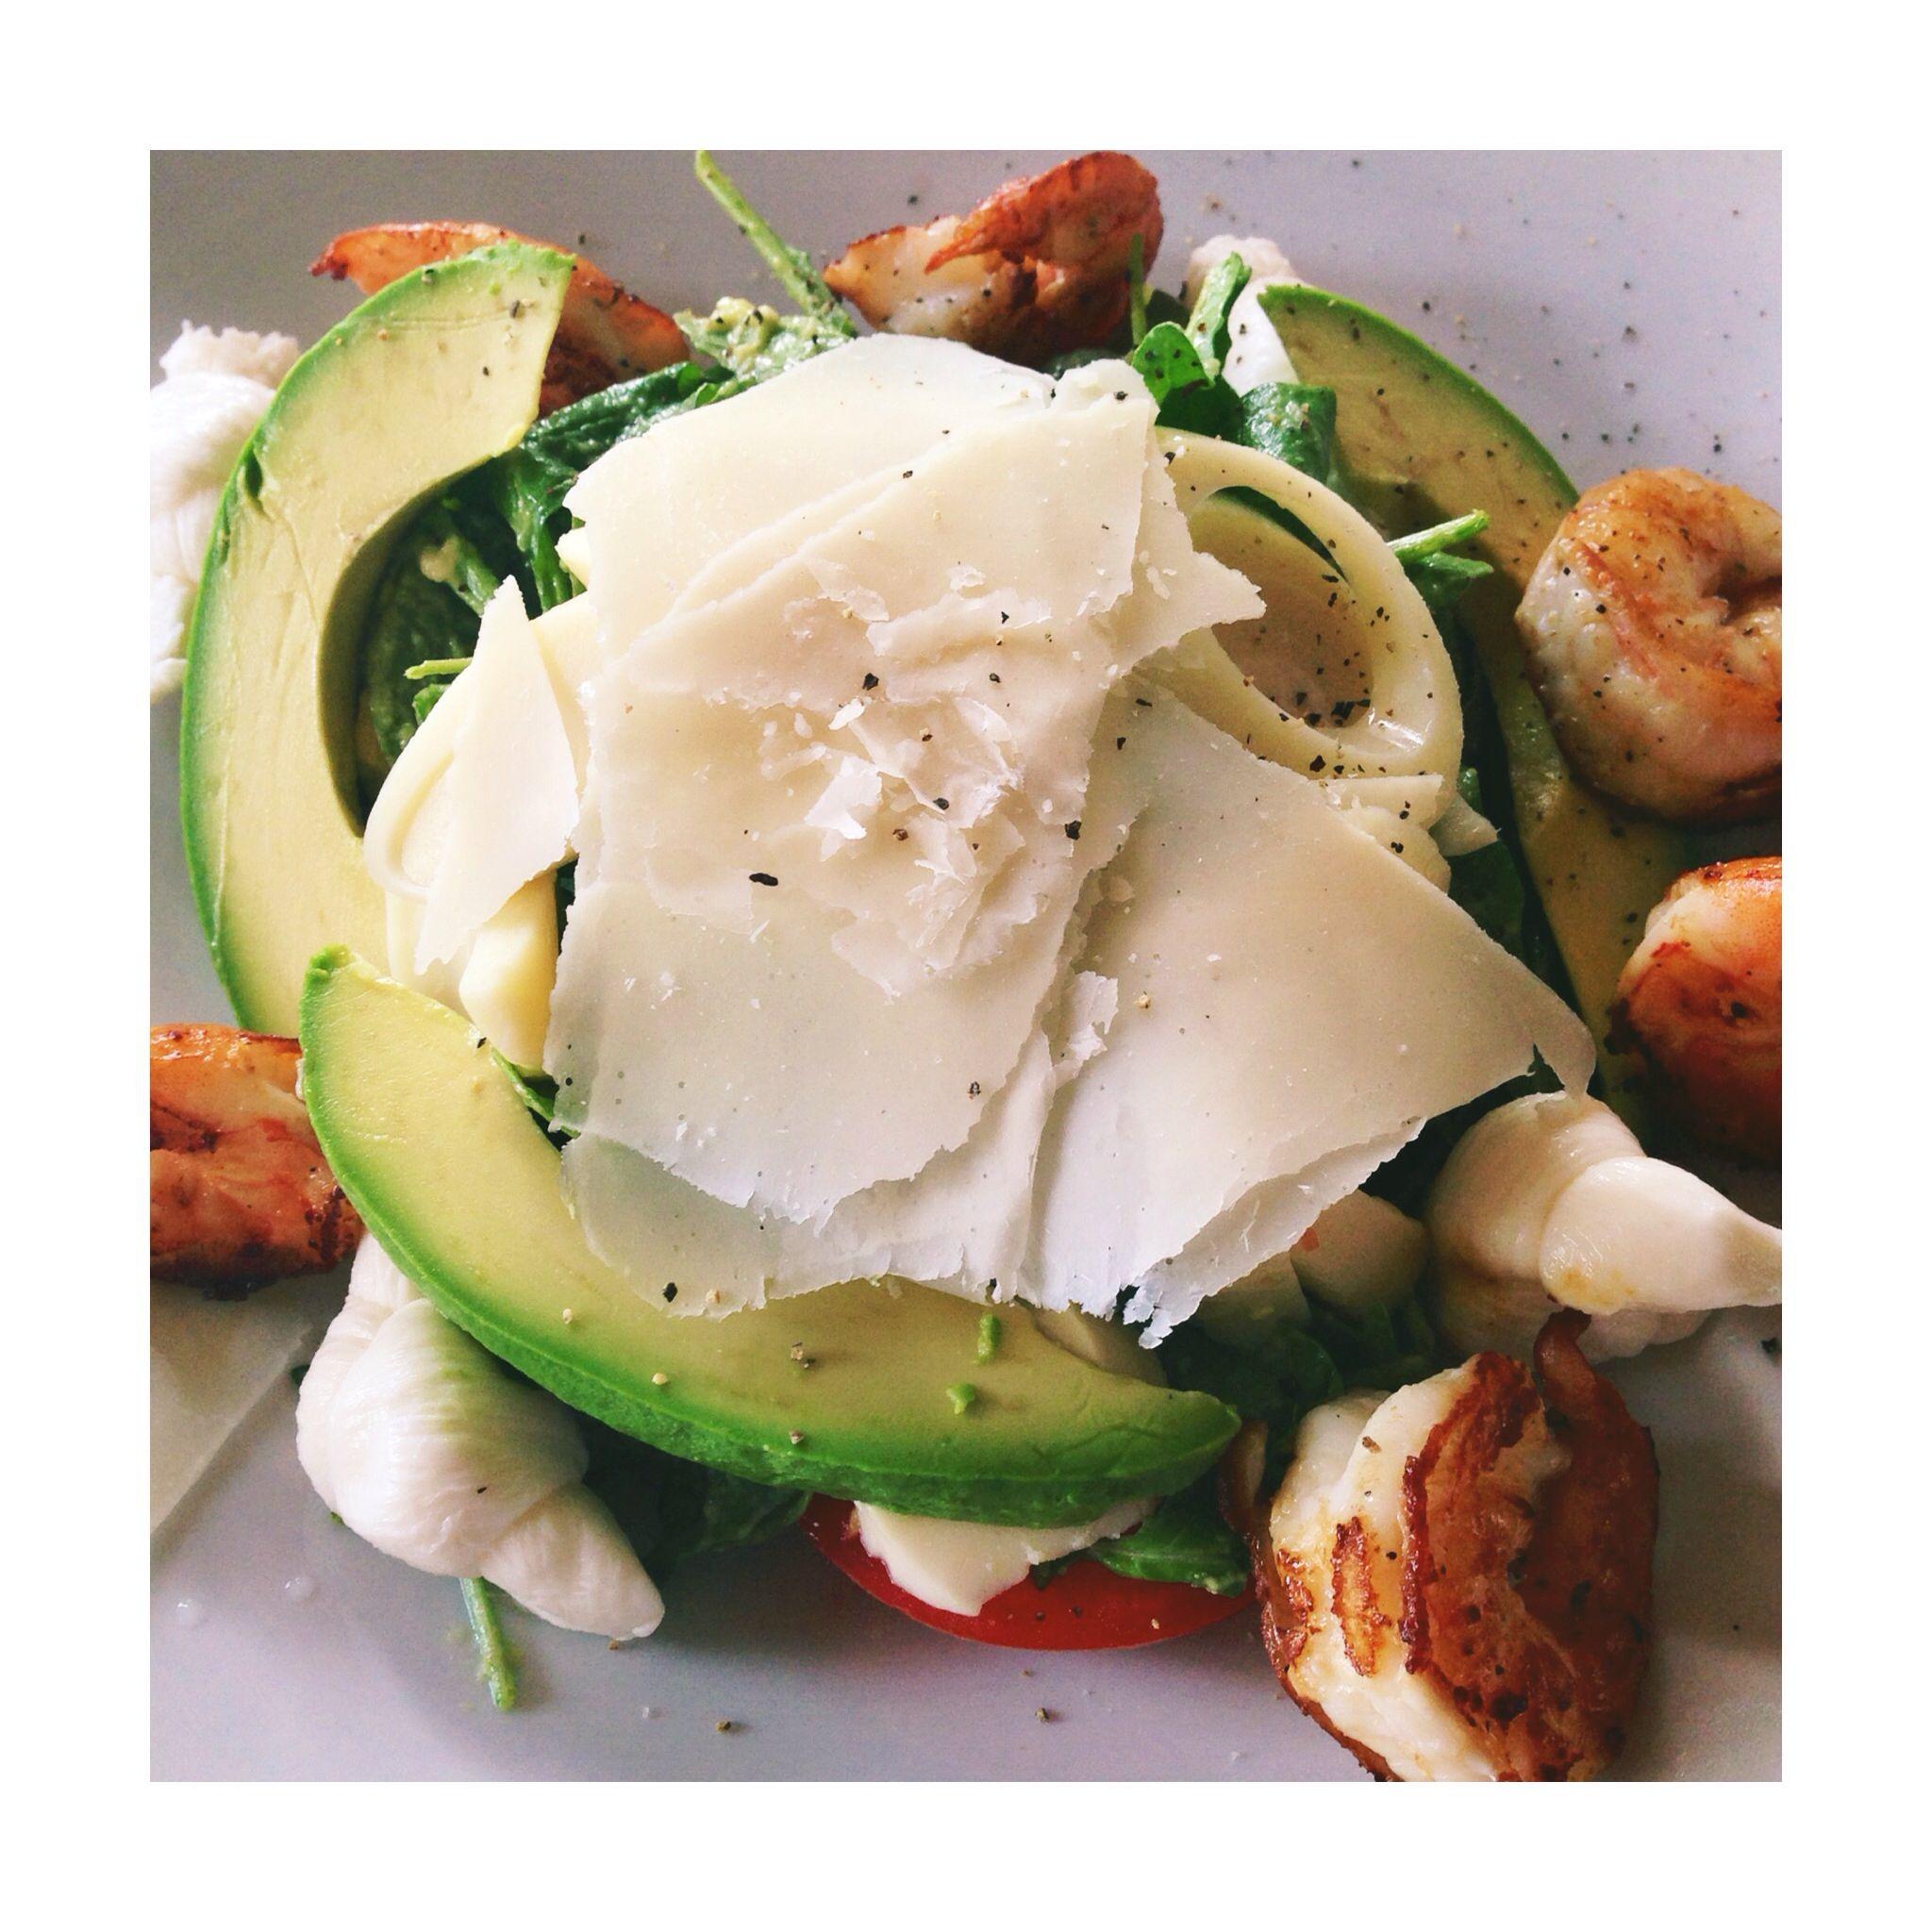 Salad with grilled shrimp & avocado